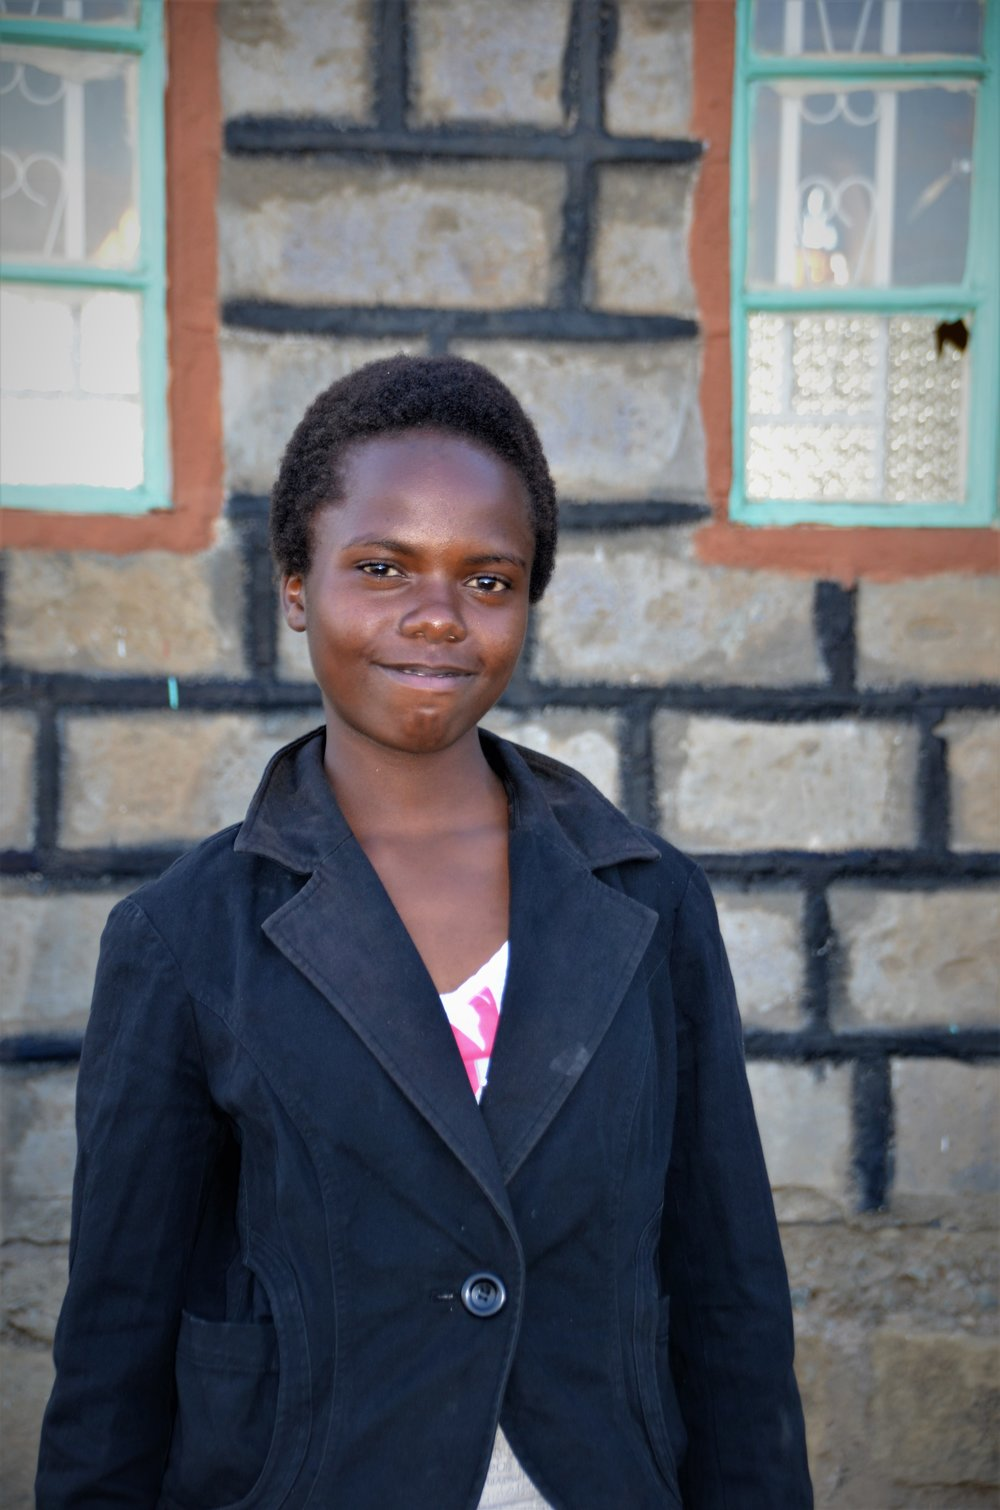 Student_Sponsorship_Kenya_Cynthia.JPG